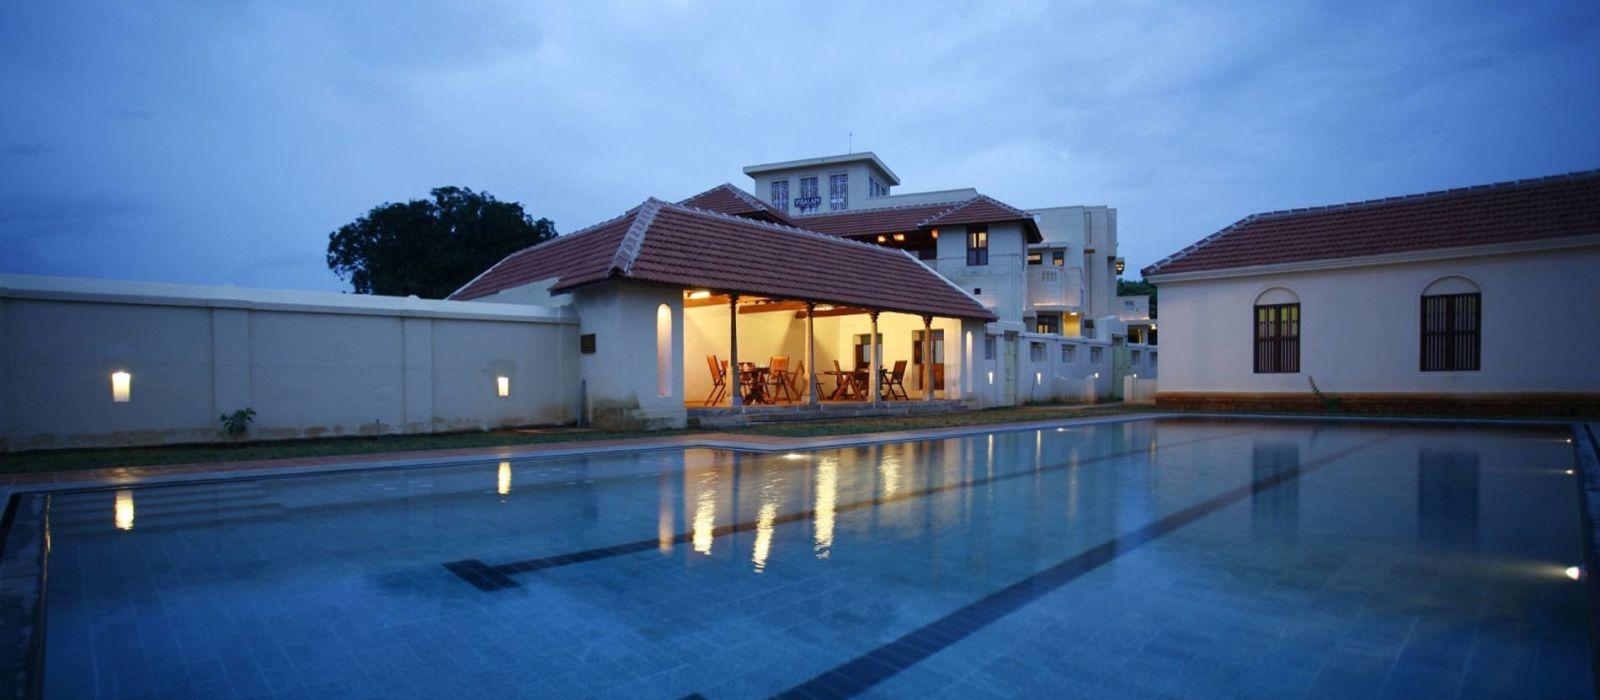 Hotel Visalam South India